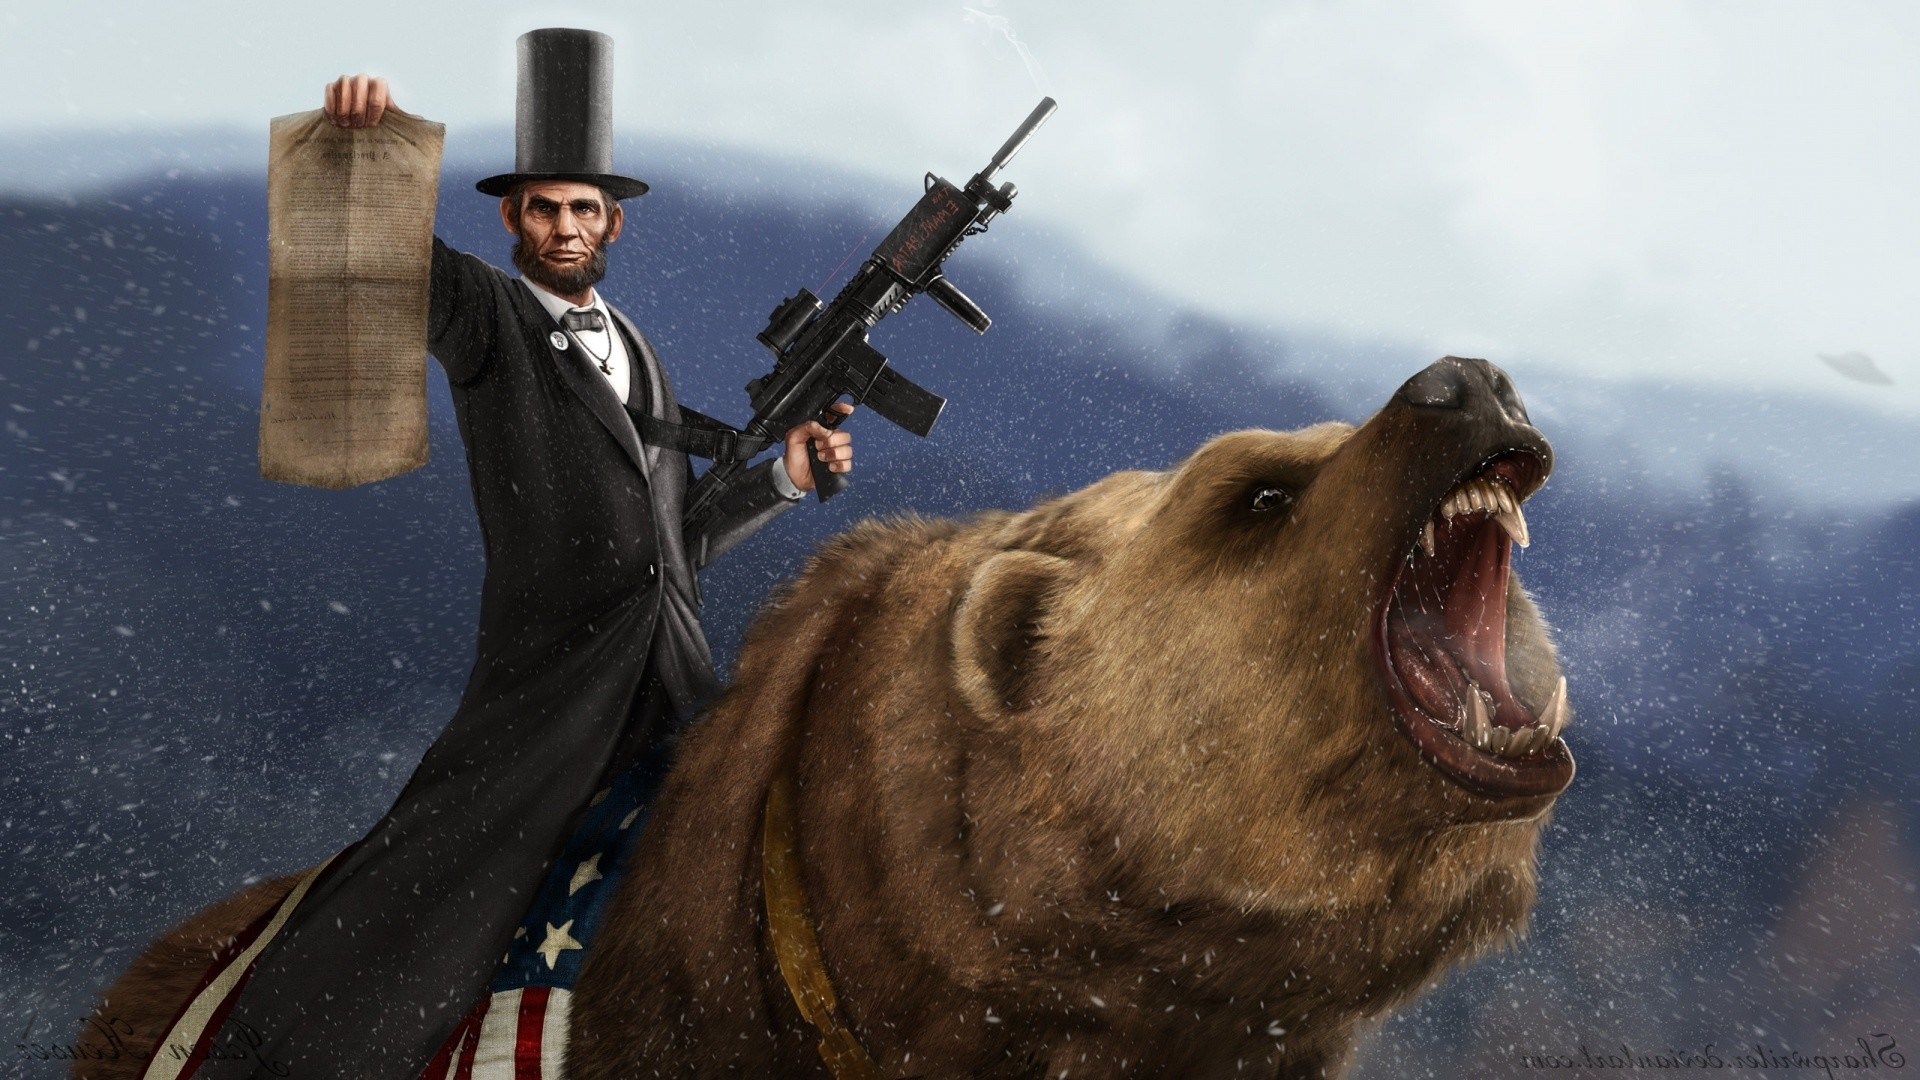 Abraham Lincoln riding a bear.